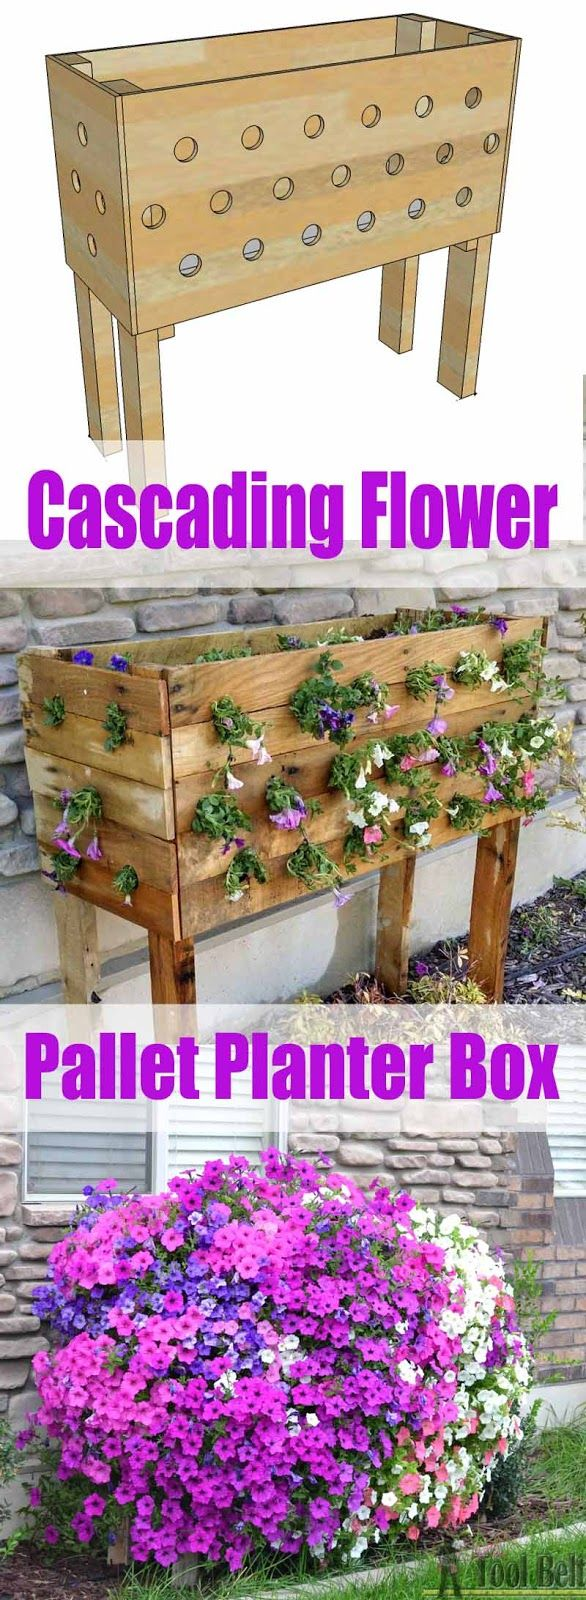 Cascading Flower Pallet Planter Box Planter Box Plans 400 x 300